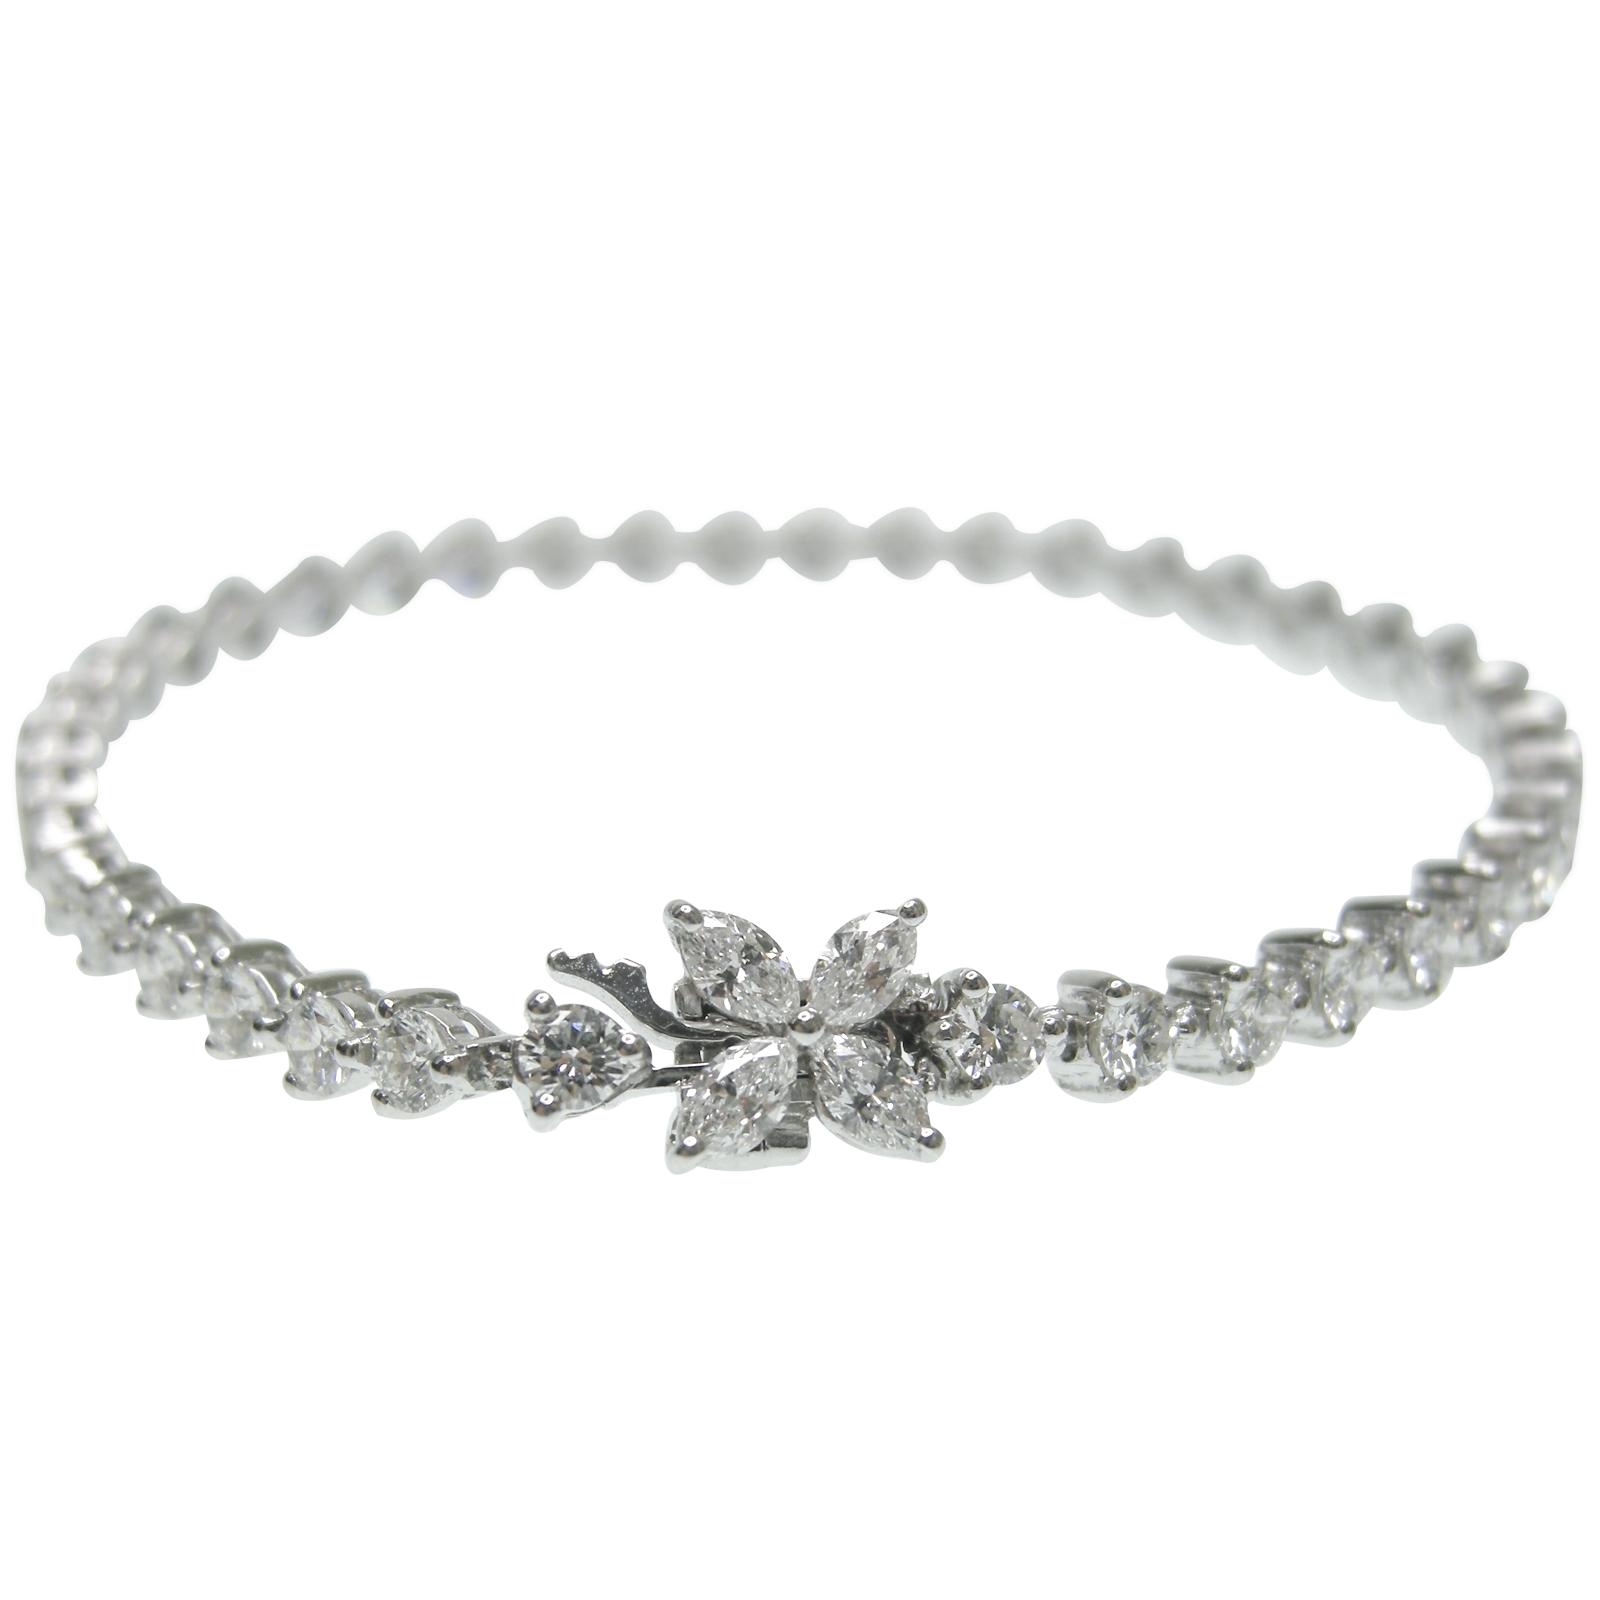 MARQUISE AND ROUND DIAMOND BRACELET CLUSTER DIAMOND PENDANT BESPOKE FINE JEWELLERY BY SHAHINA HATTA